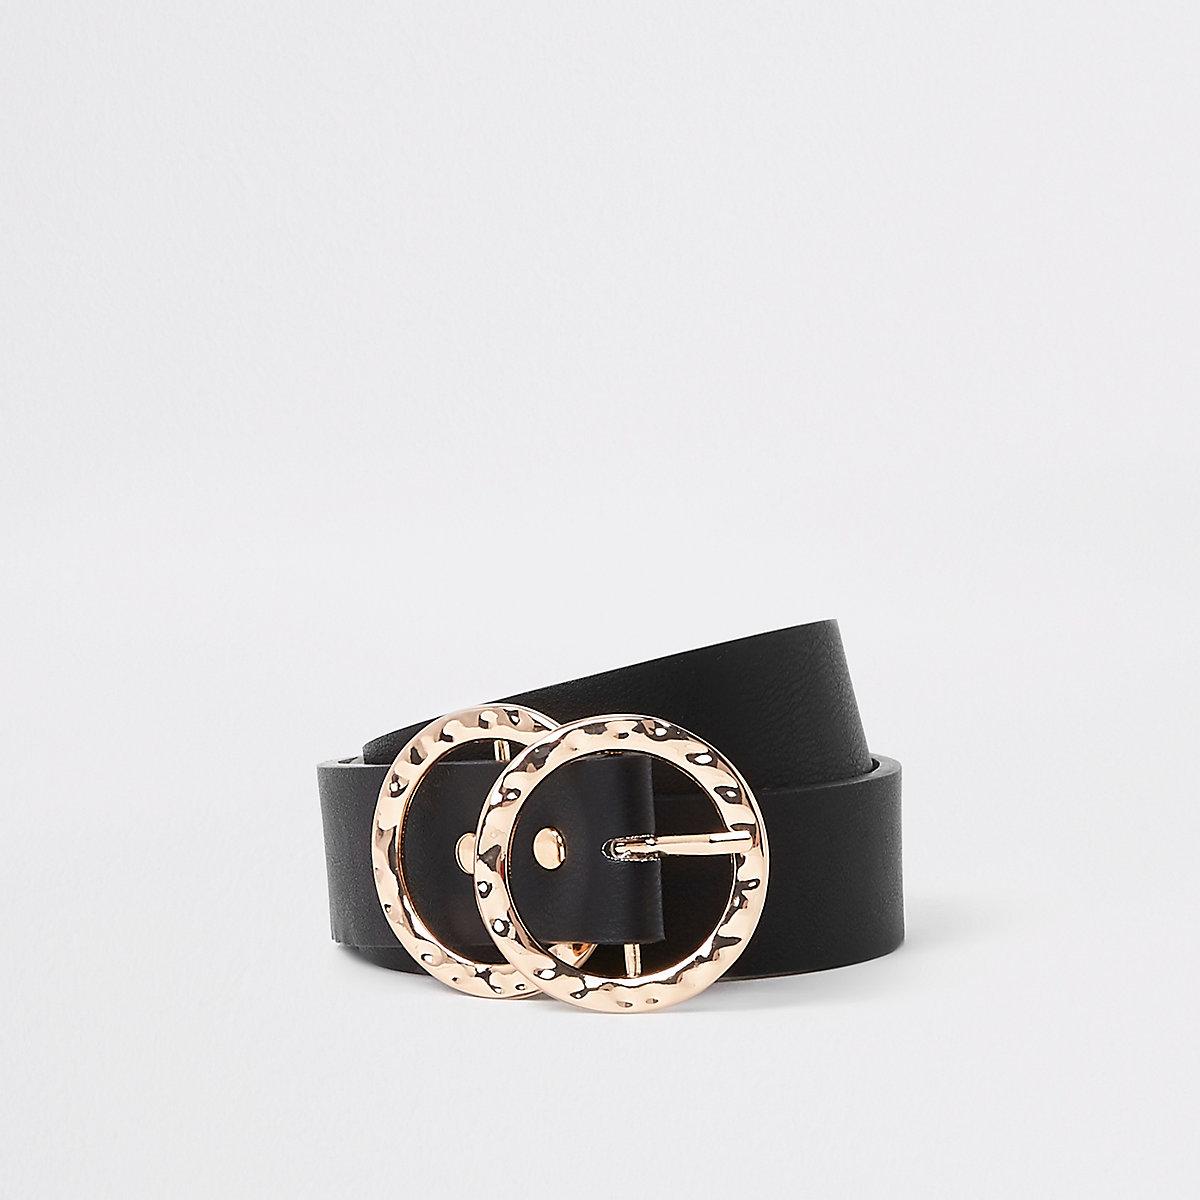 Black textured double ring belt